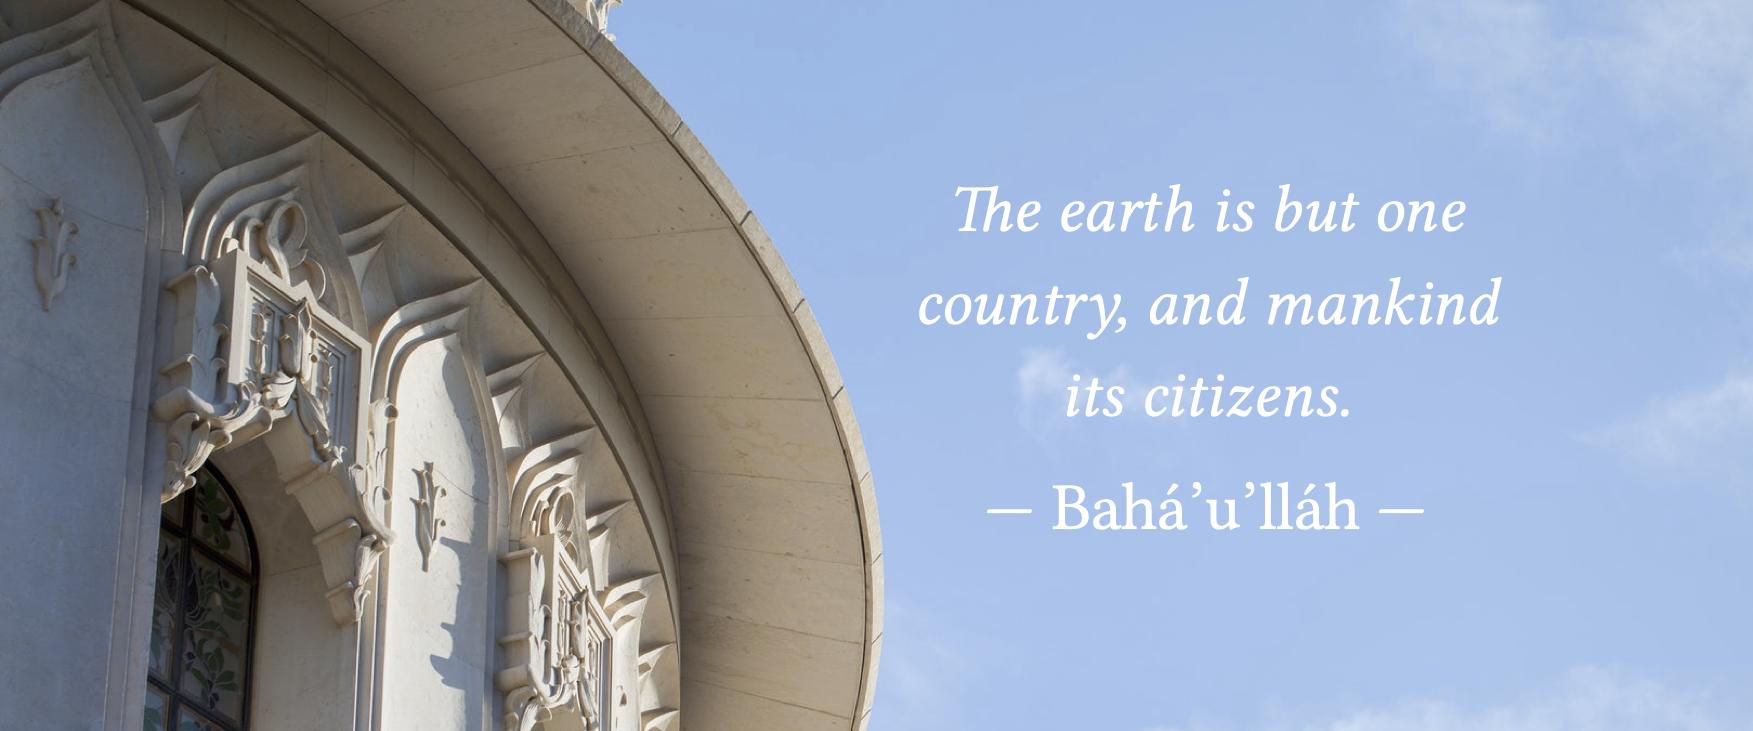 Cambridge University Bahá'í Society